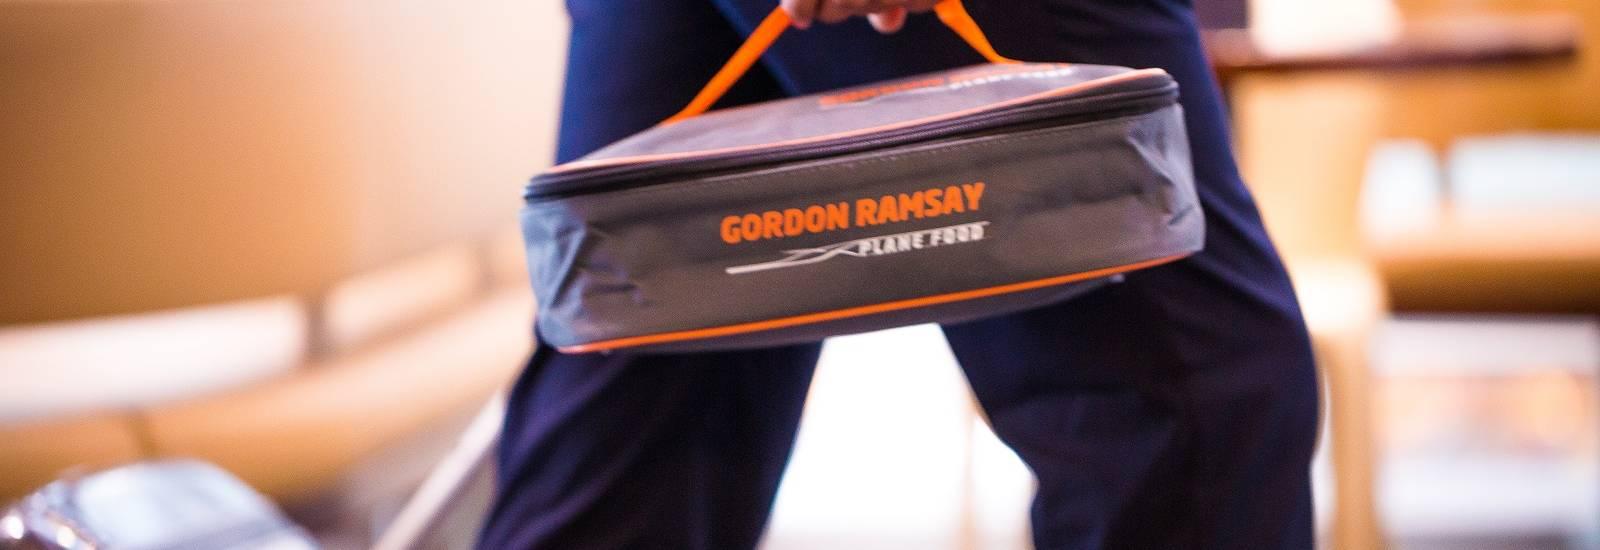 GordonRamsay picnic bag